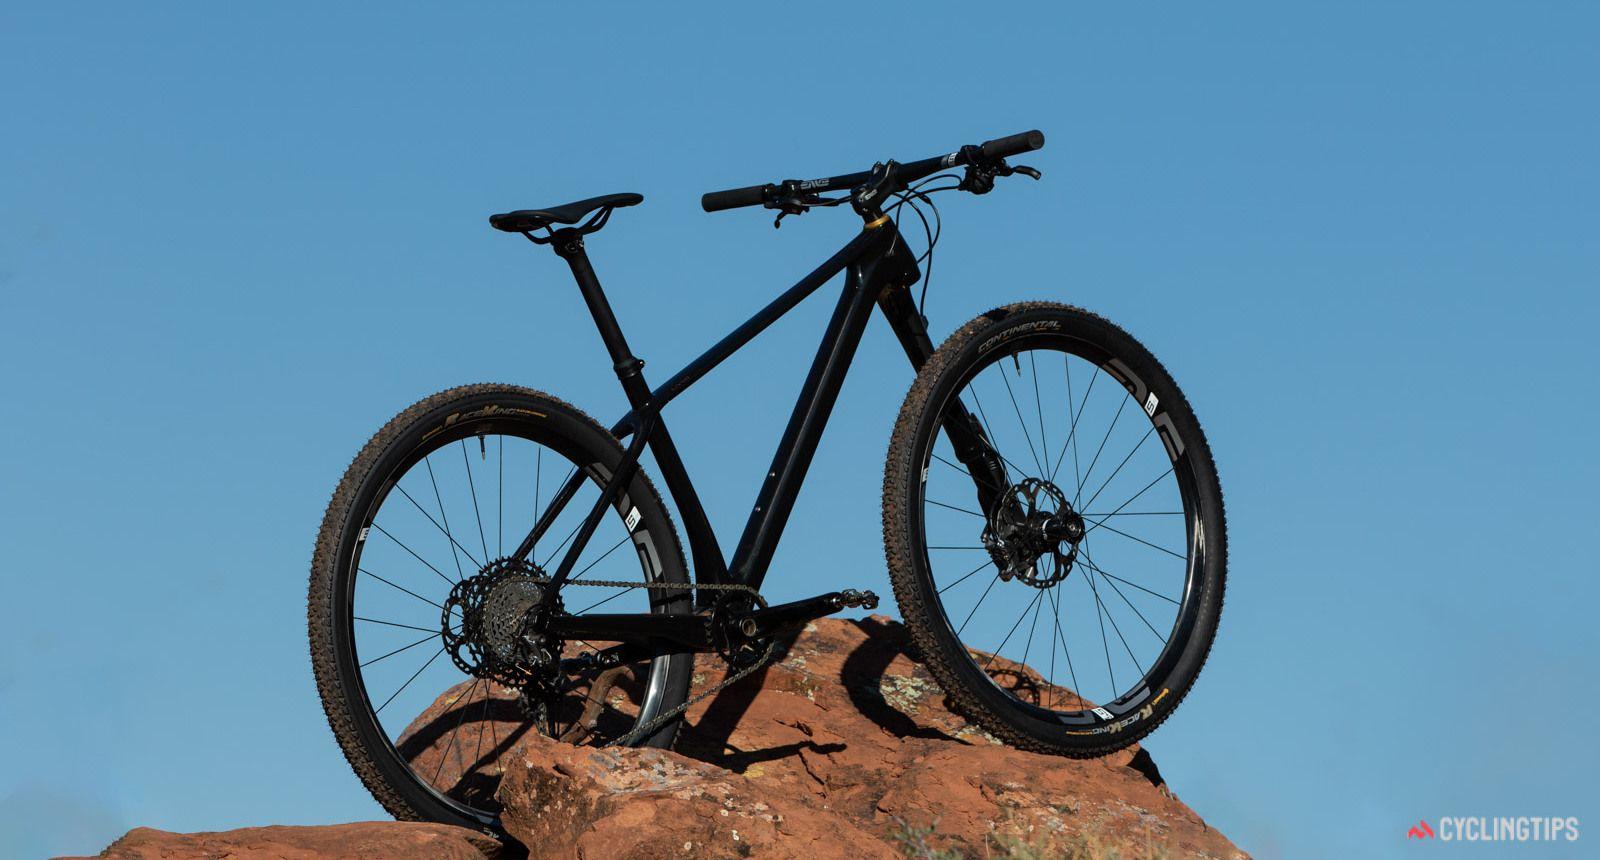 Gravel Bike Versus Mountain Bike